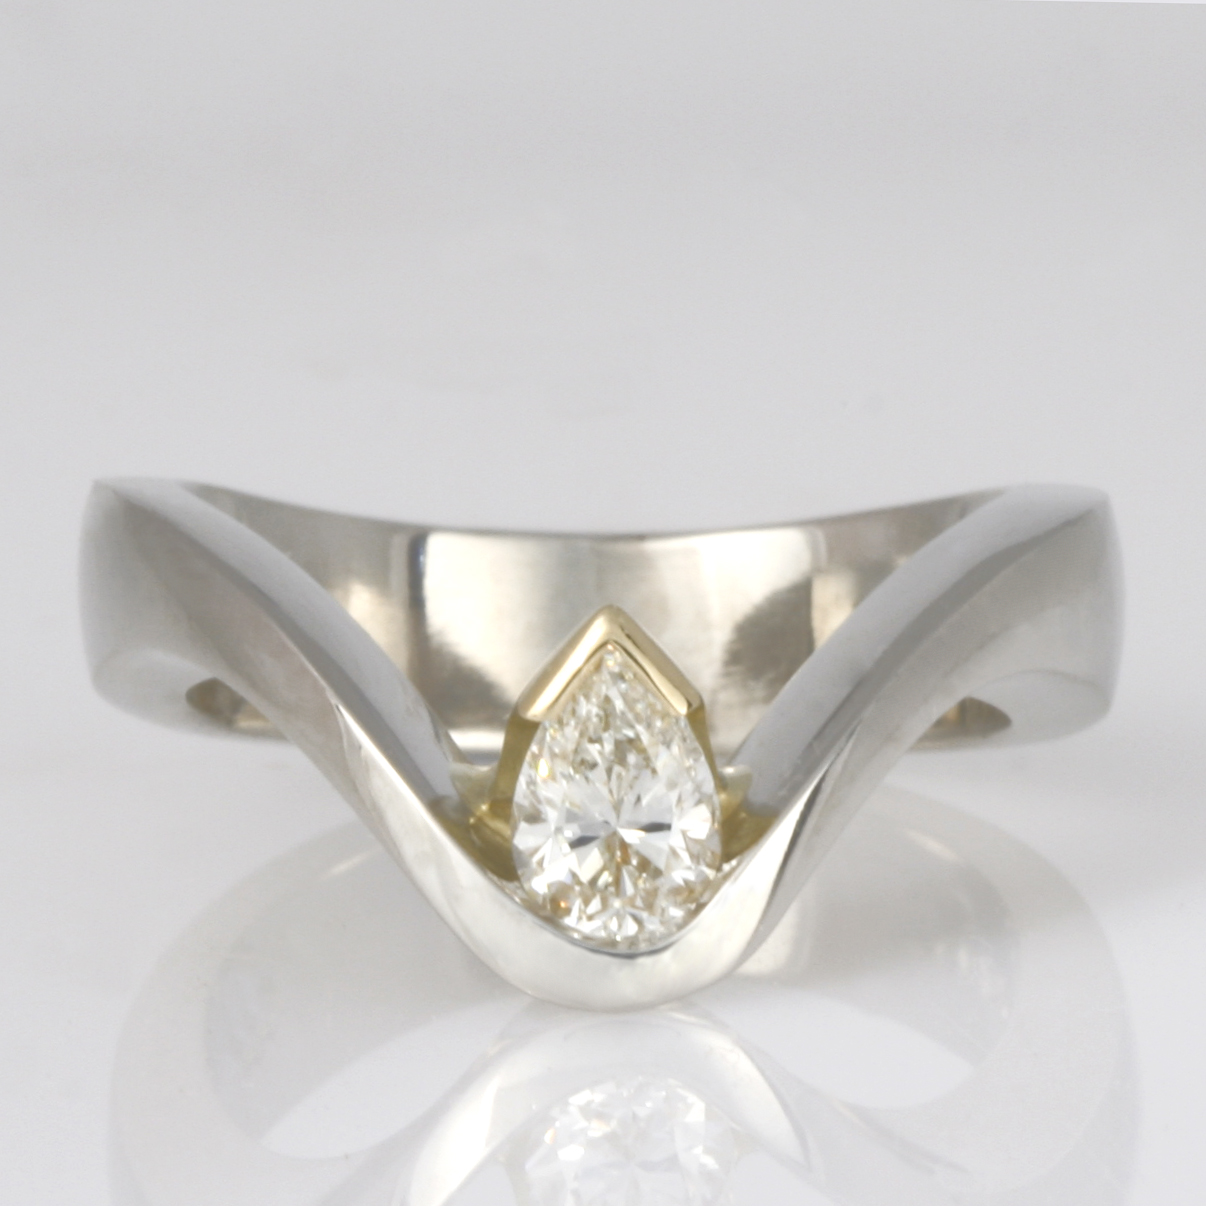 Handmade ladies palladium and 18ct yellow gold pear shape diamond engagement ring